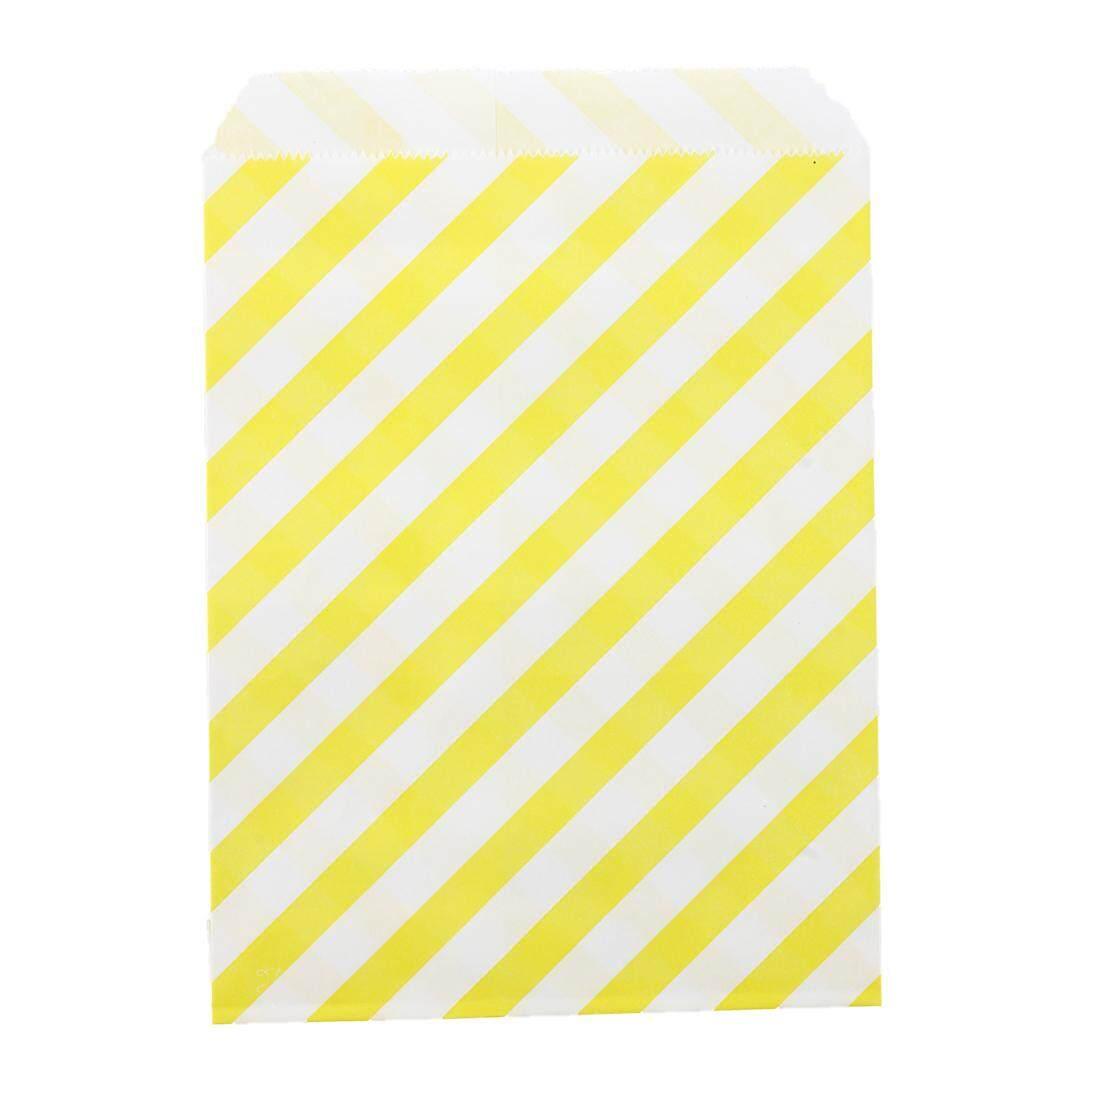 25 Pcs Garis Kertas Manis Tas Kue Permen Buffet Hadiah Pernikahan 17.8X12.7 Cm Kuning-Internasional